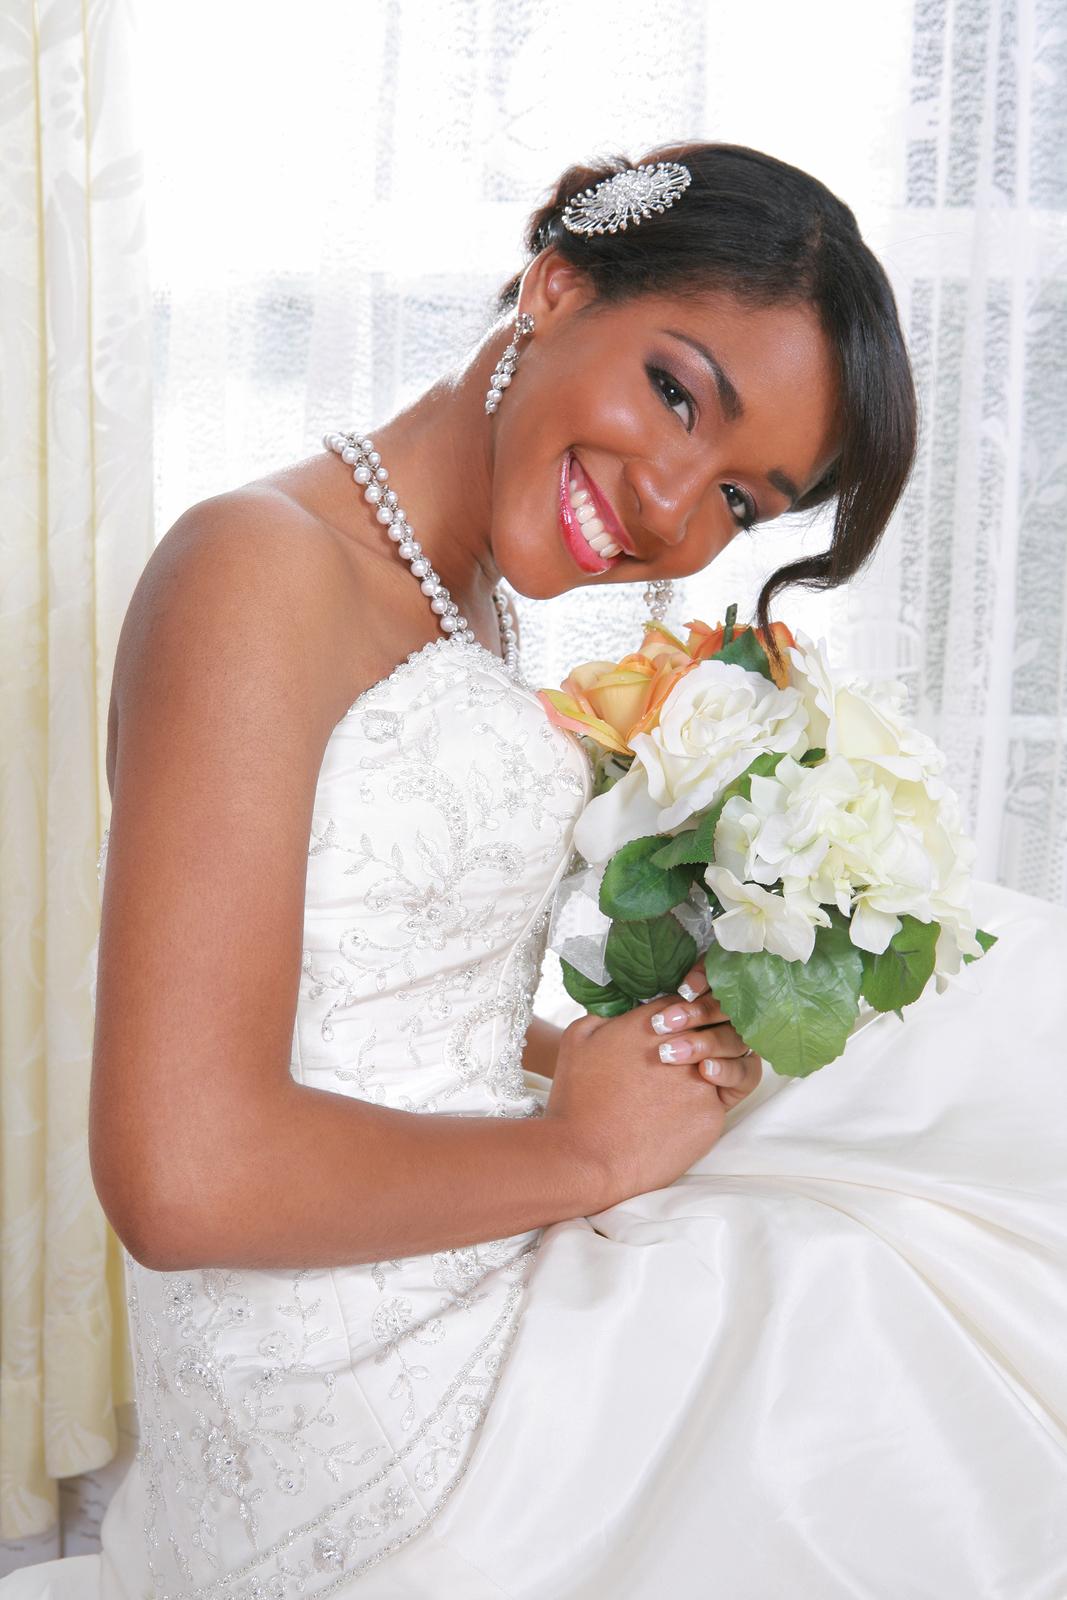 bigstock-Beautiful-Young-Bride-Sitting--4480531.jpg